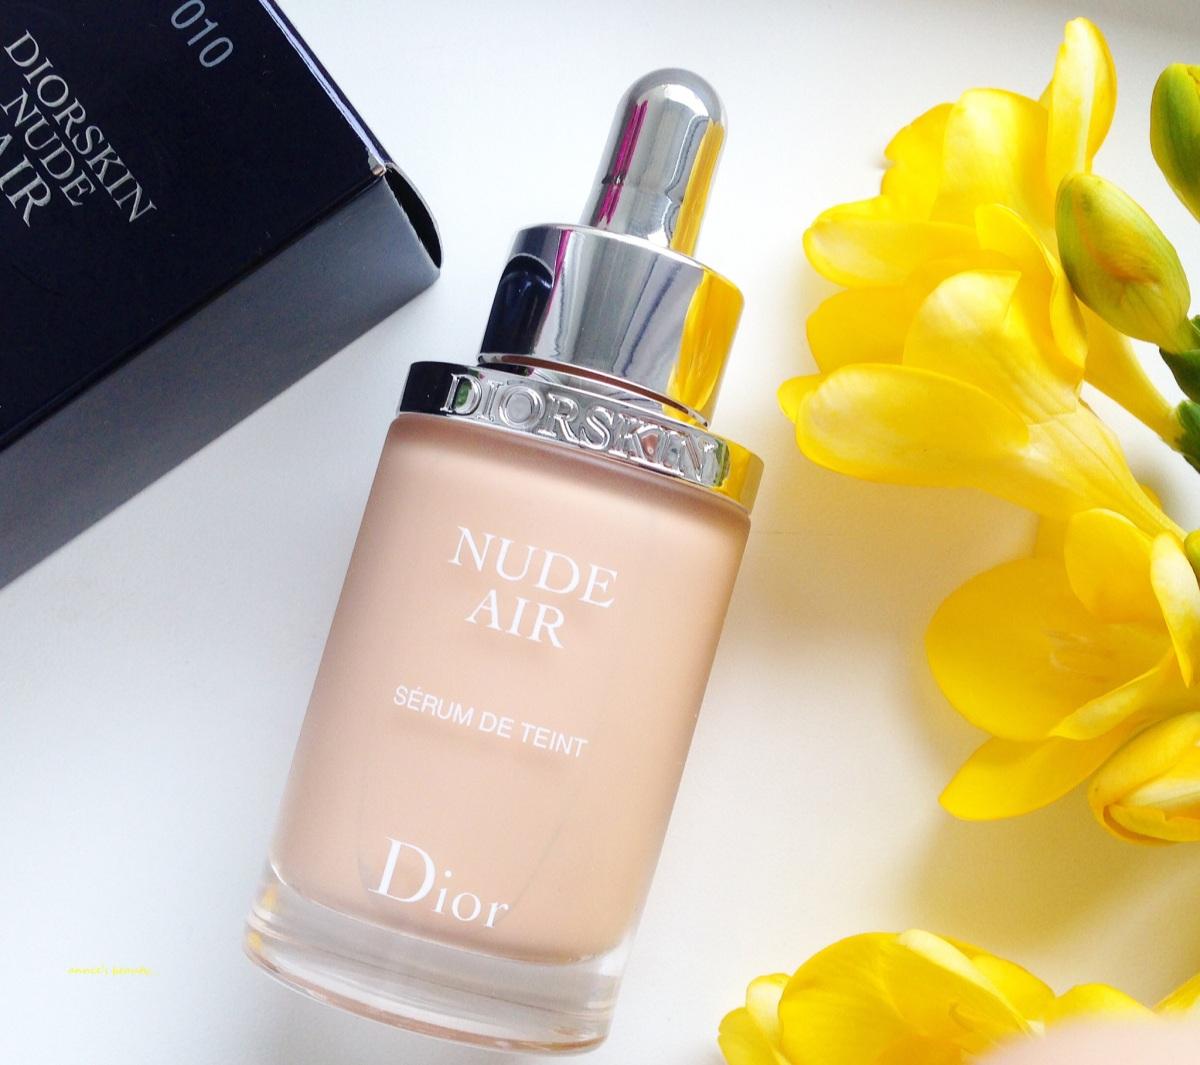 Dior Diorskin Nude Air Healthy Glow Ultra-Fluid Serum Foundation SPF 25 – PA++ #010 Ivory